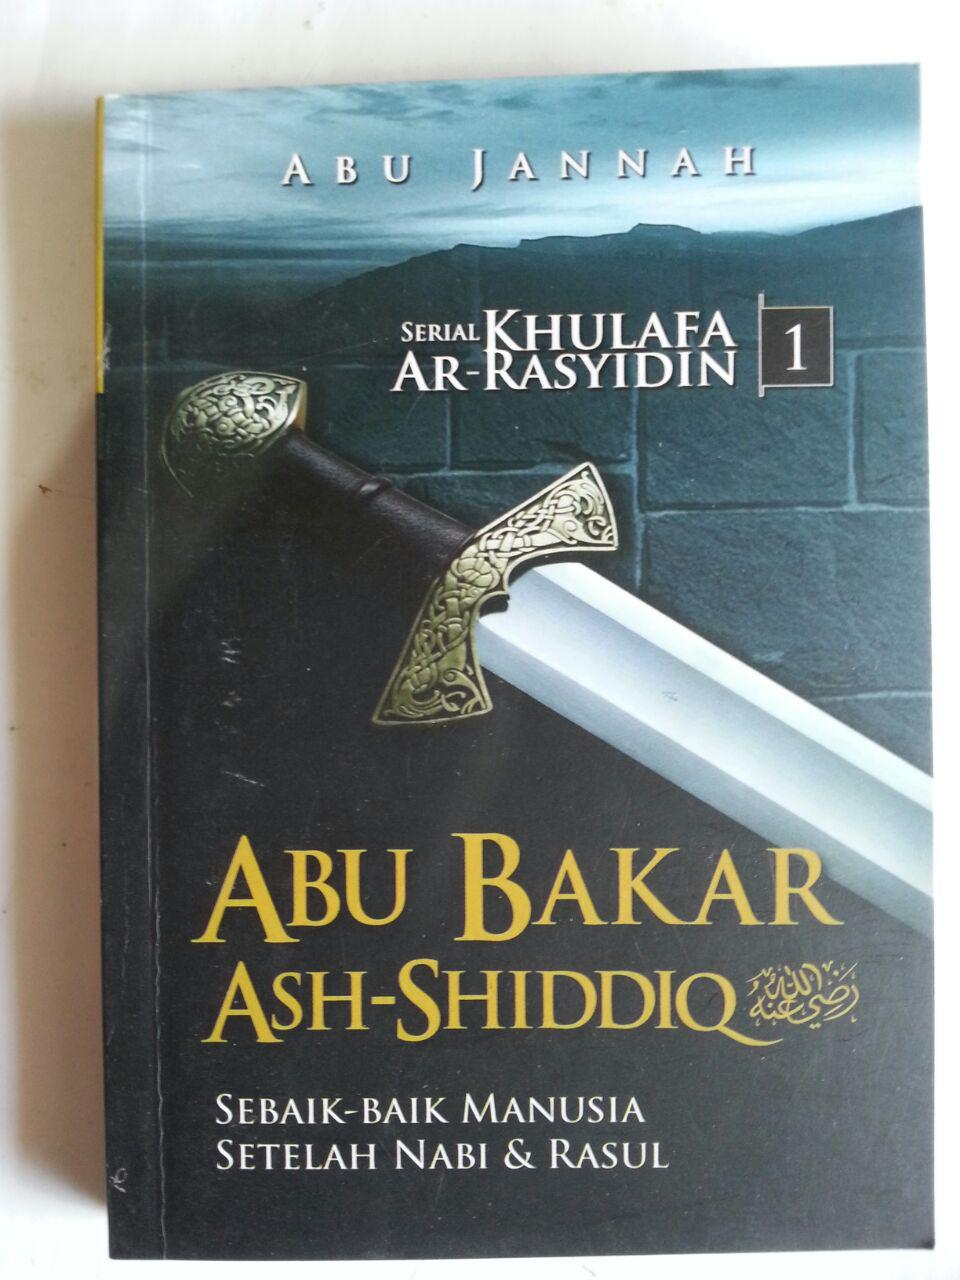 Buku Serial Khulafa Ar-Rasyidin 1 Set 4 Jilid cover 2